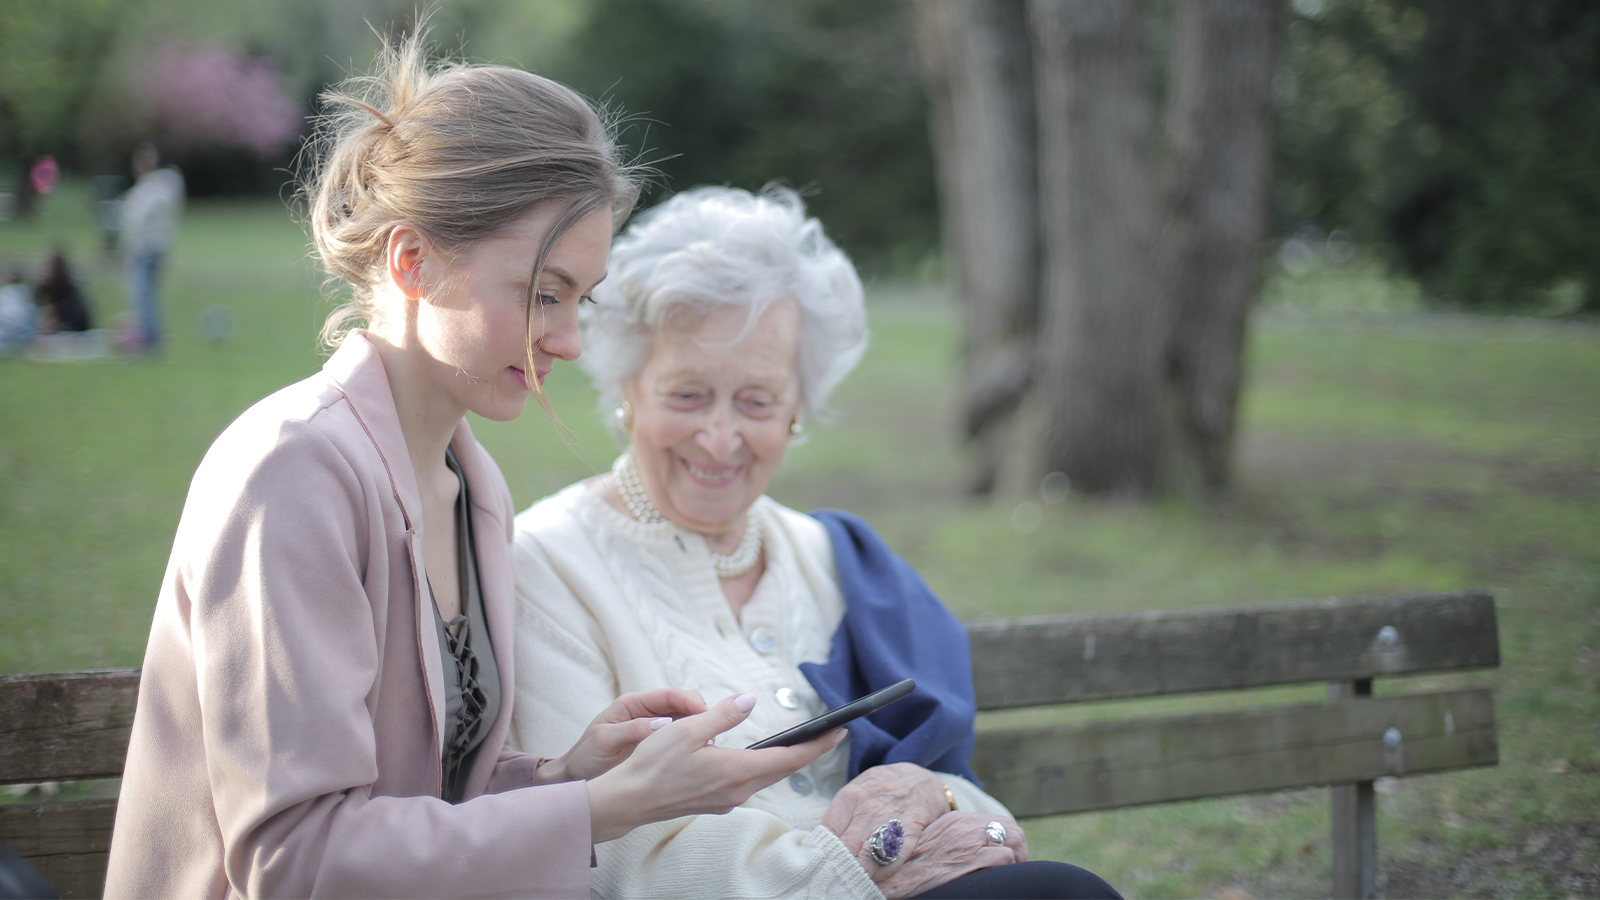 woman showing her elderly mother something on her phone, explaining intelligent digital assistants